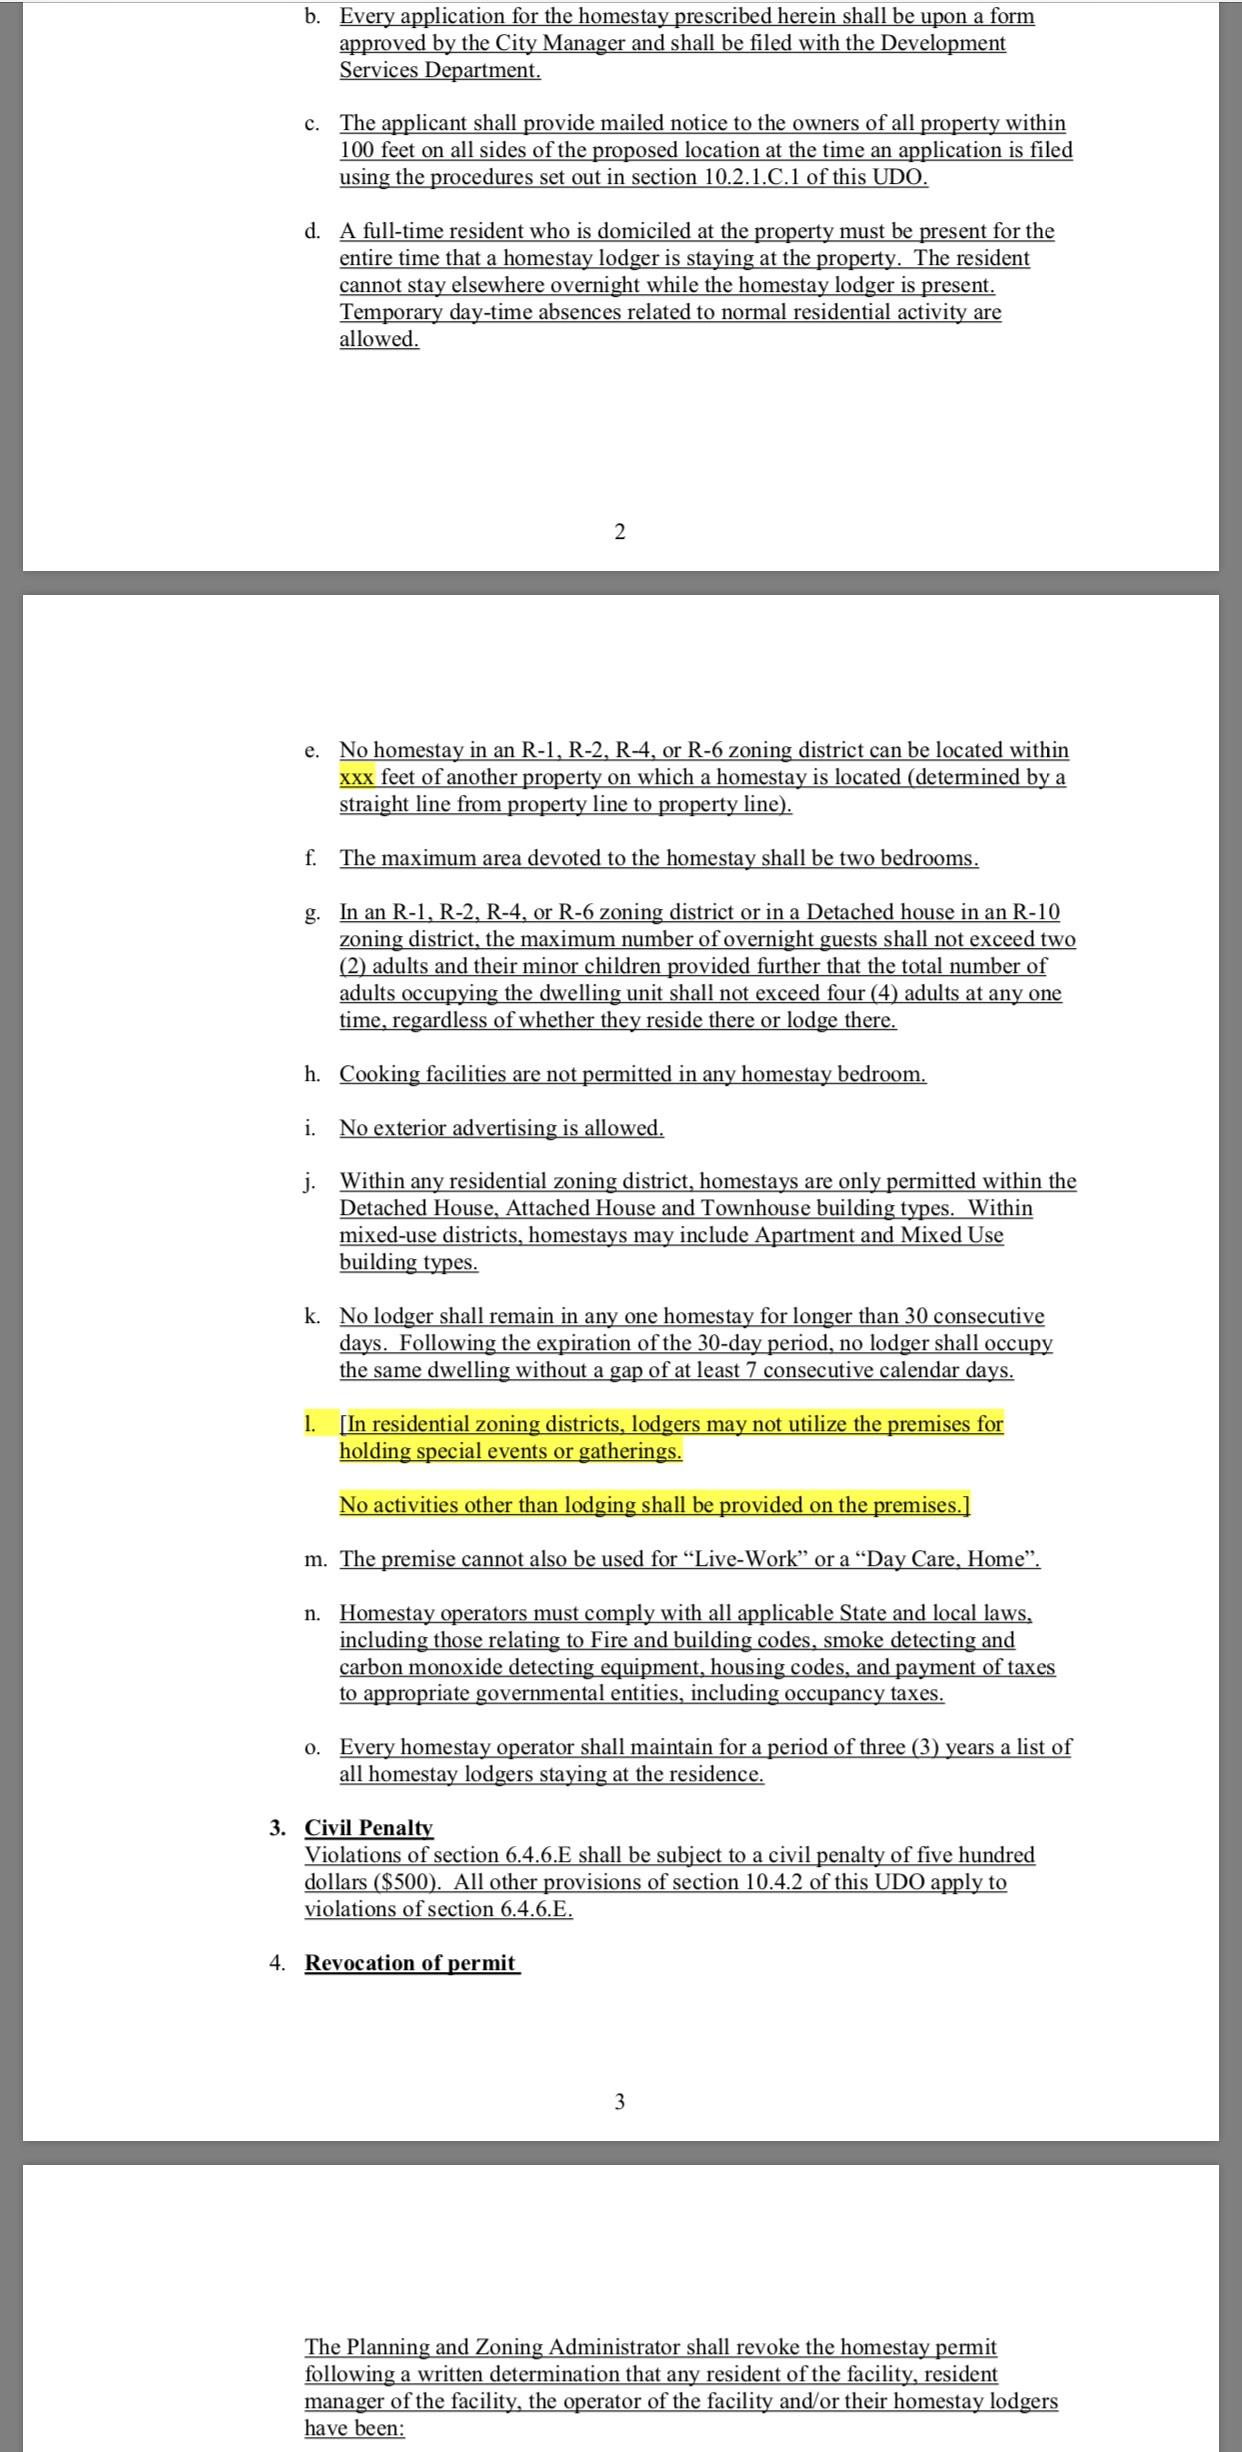 str ordinance 2_1.15.19.jpg